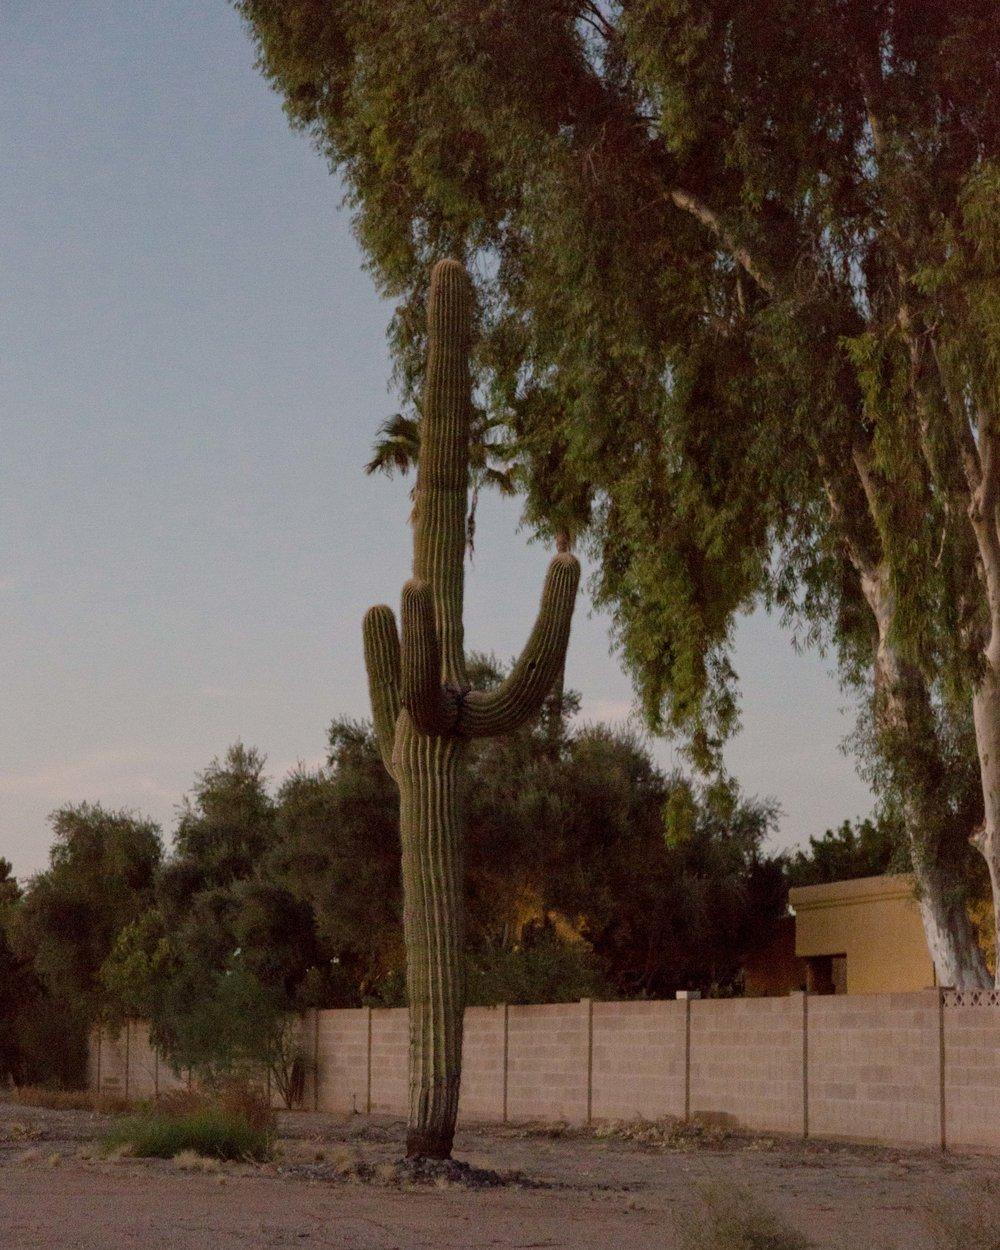 Scottsdale-02.jpg